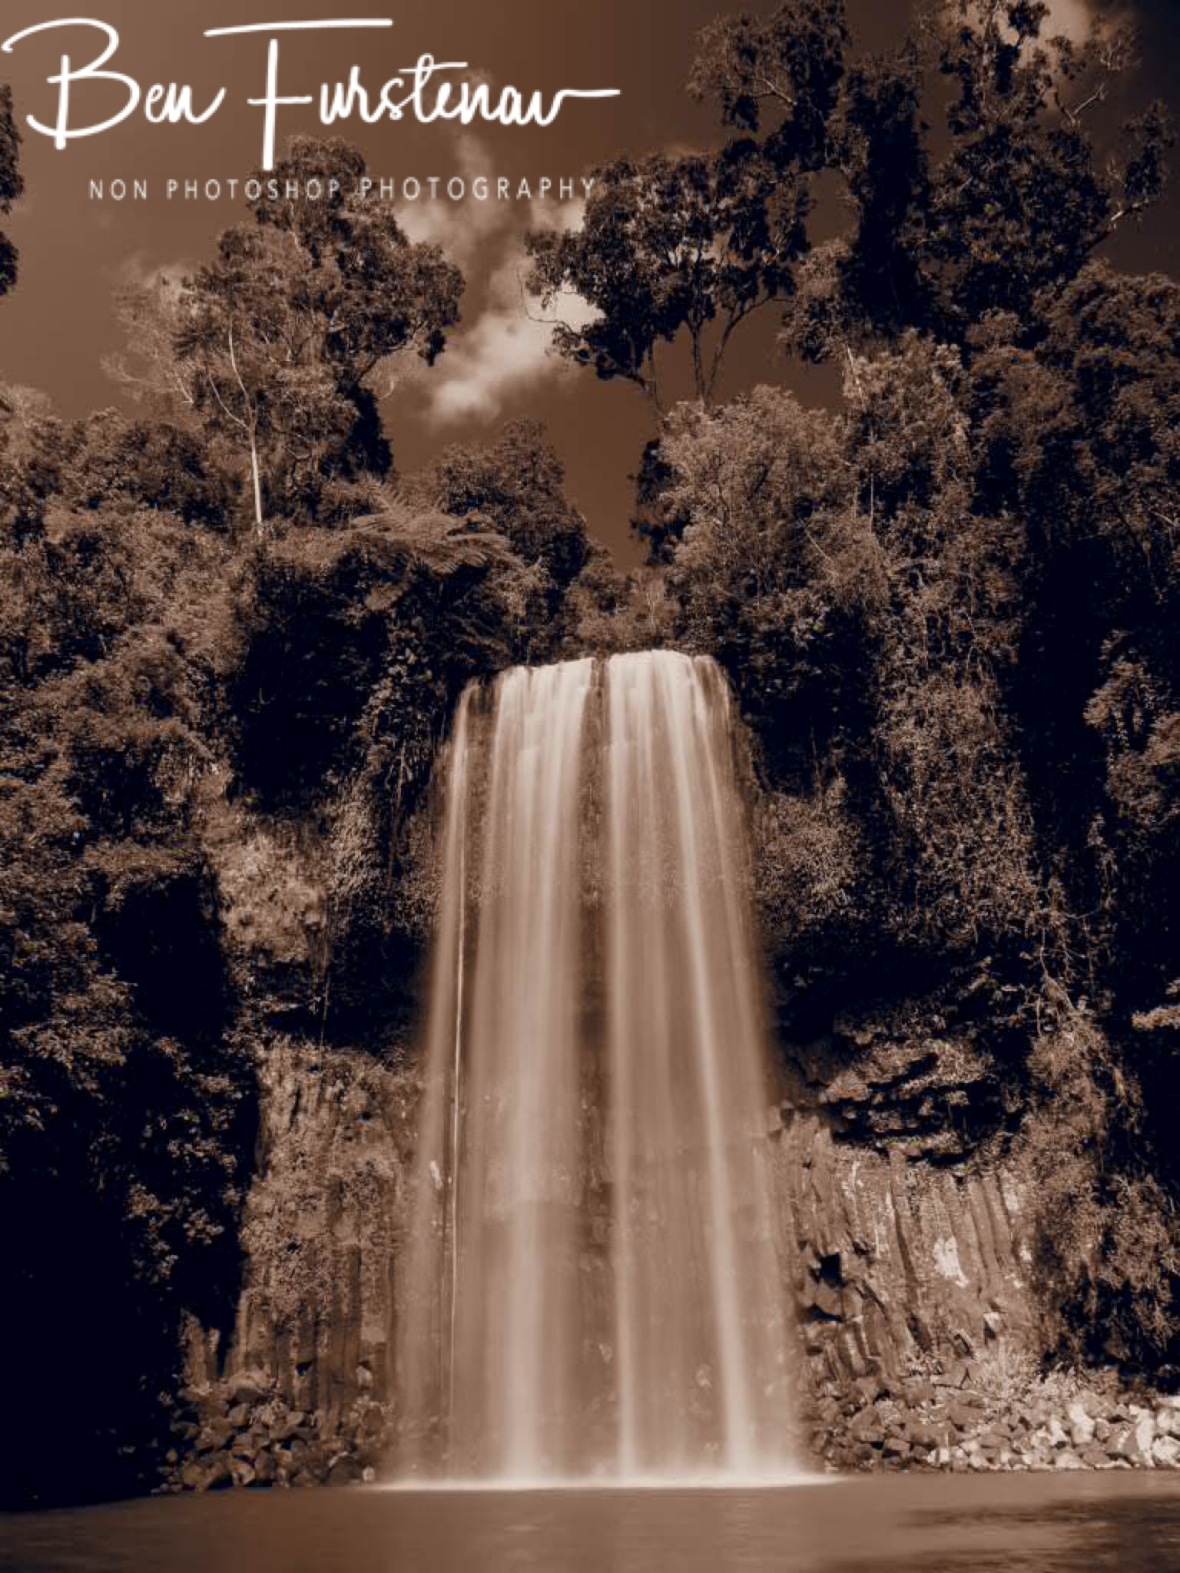 Millaa Millaa Falls in sepia, Atherton Tablelands, Far North Queensland, Australia